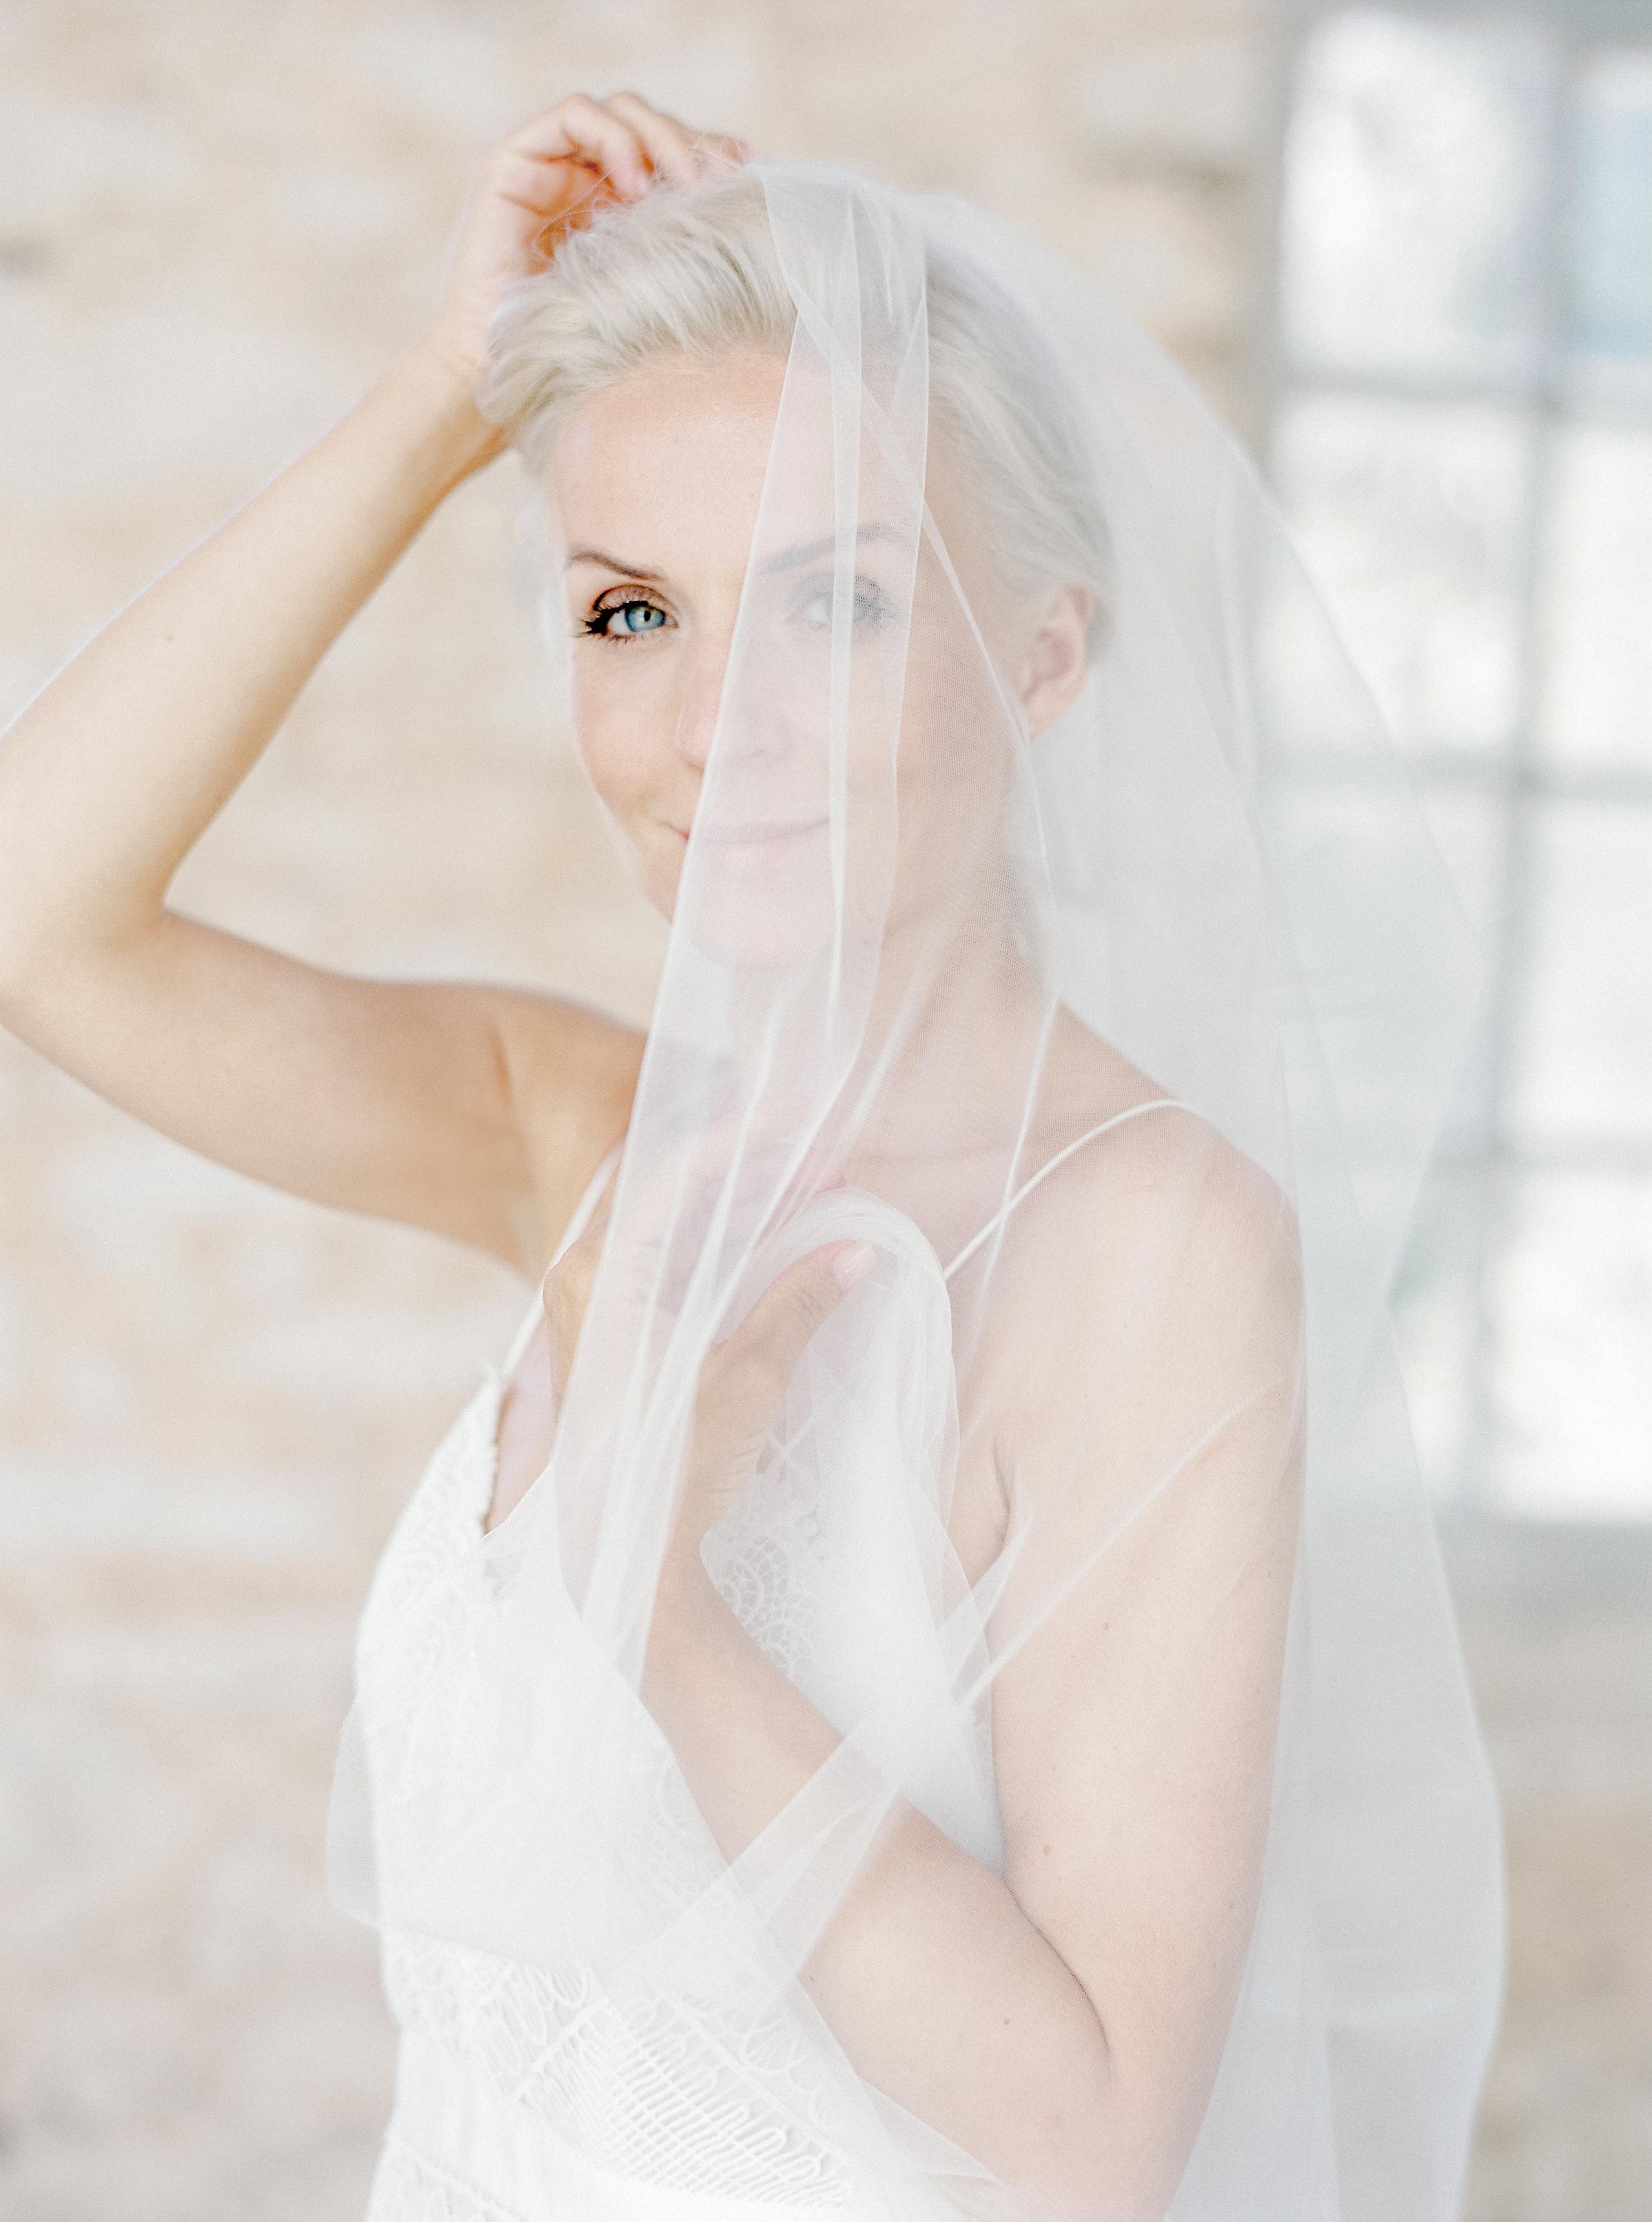 Nastia_Vesna_Photography_Wedding_Portugal_29.jpg